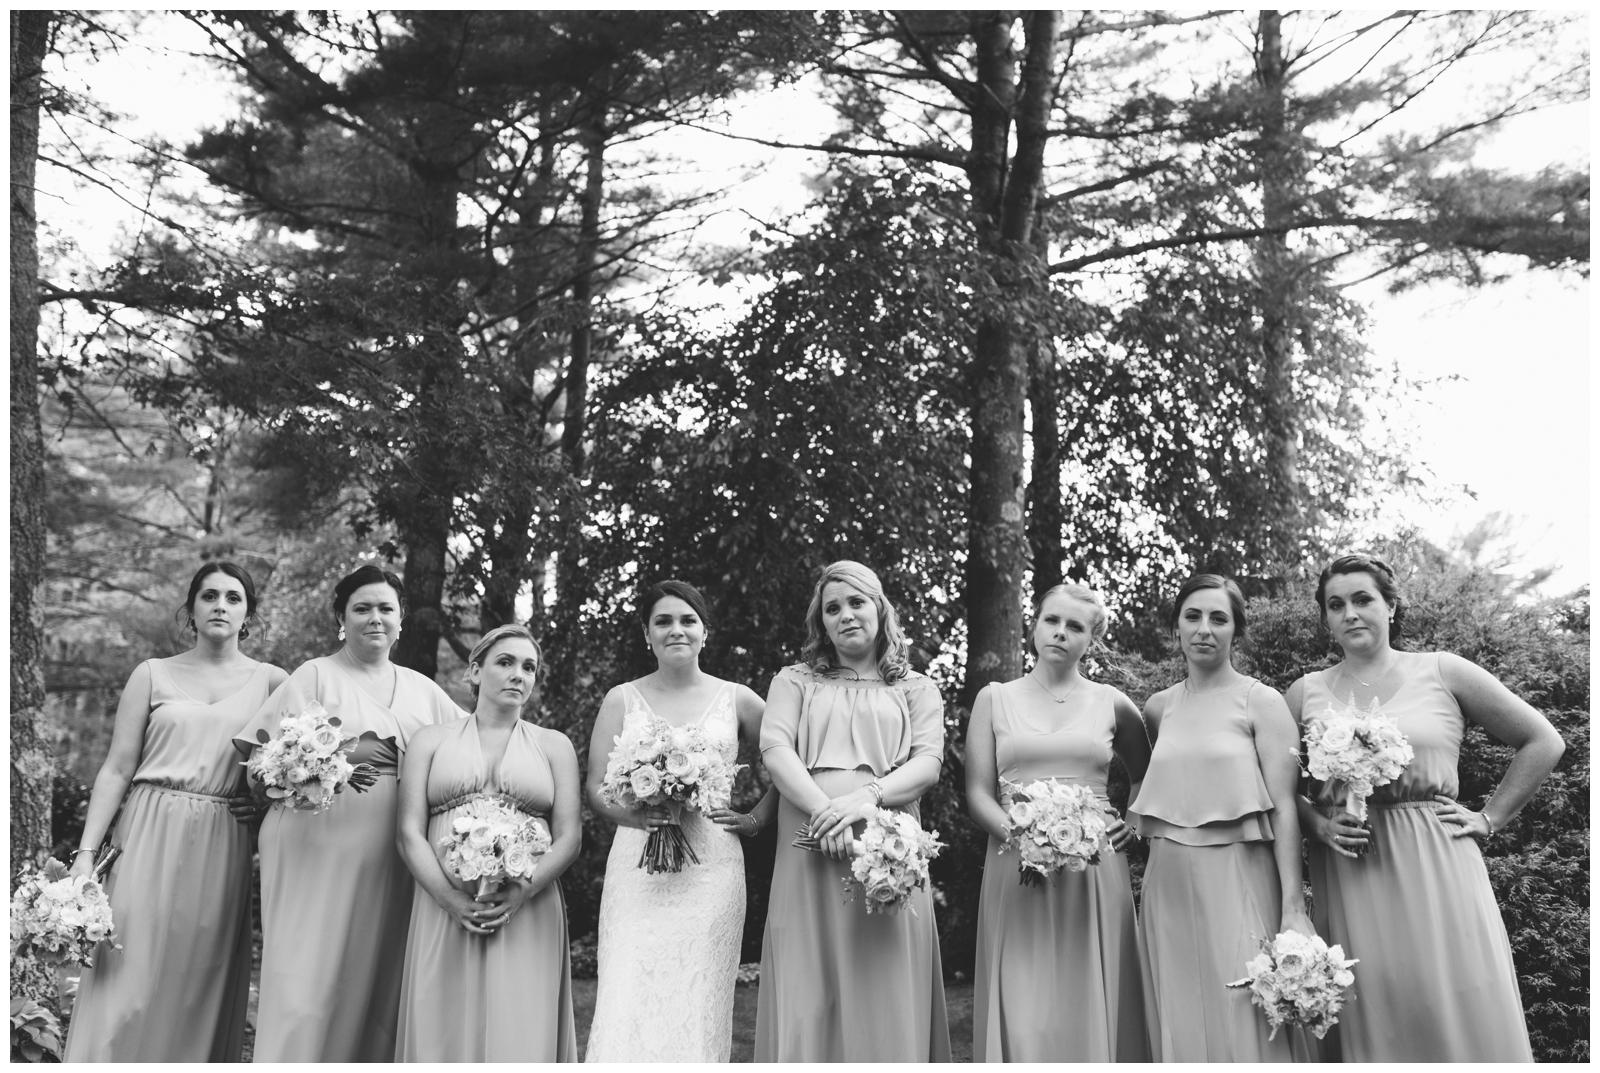 Bailey-Q-Photo-Pine-Hills-Pavilion-Wedding-Boston-Wedding-Photographer-030.jpg